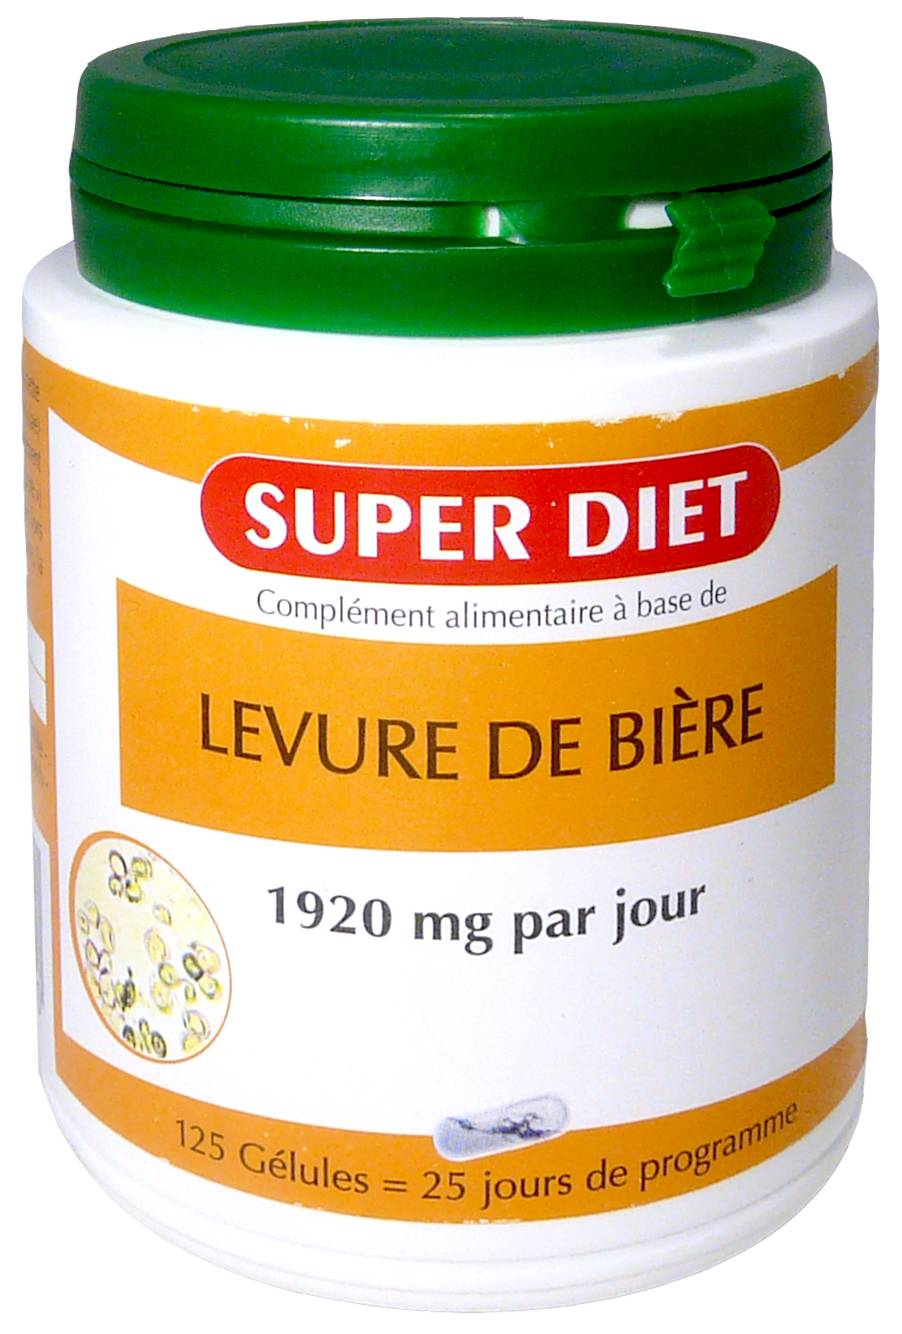 Super diet levure de biere 125 gelules